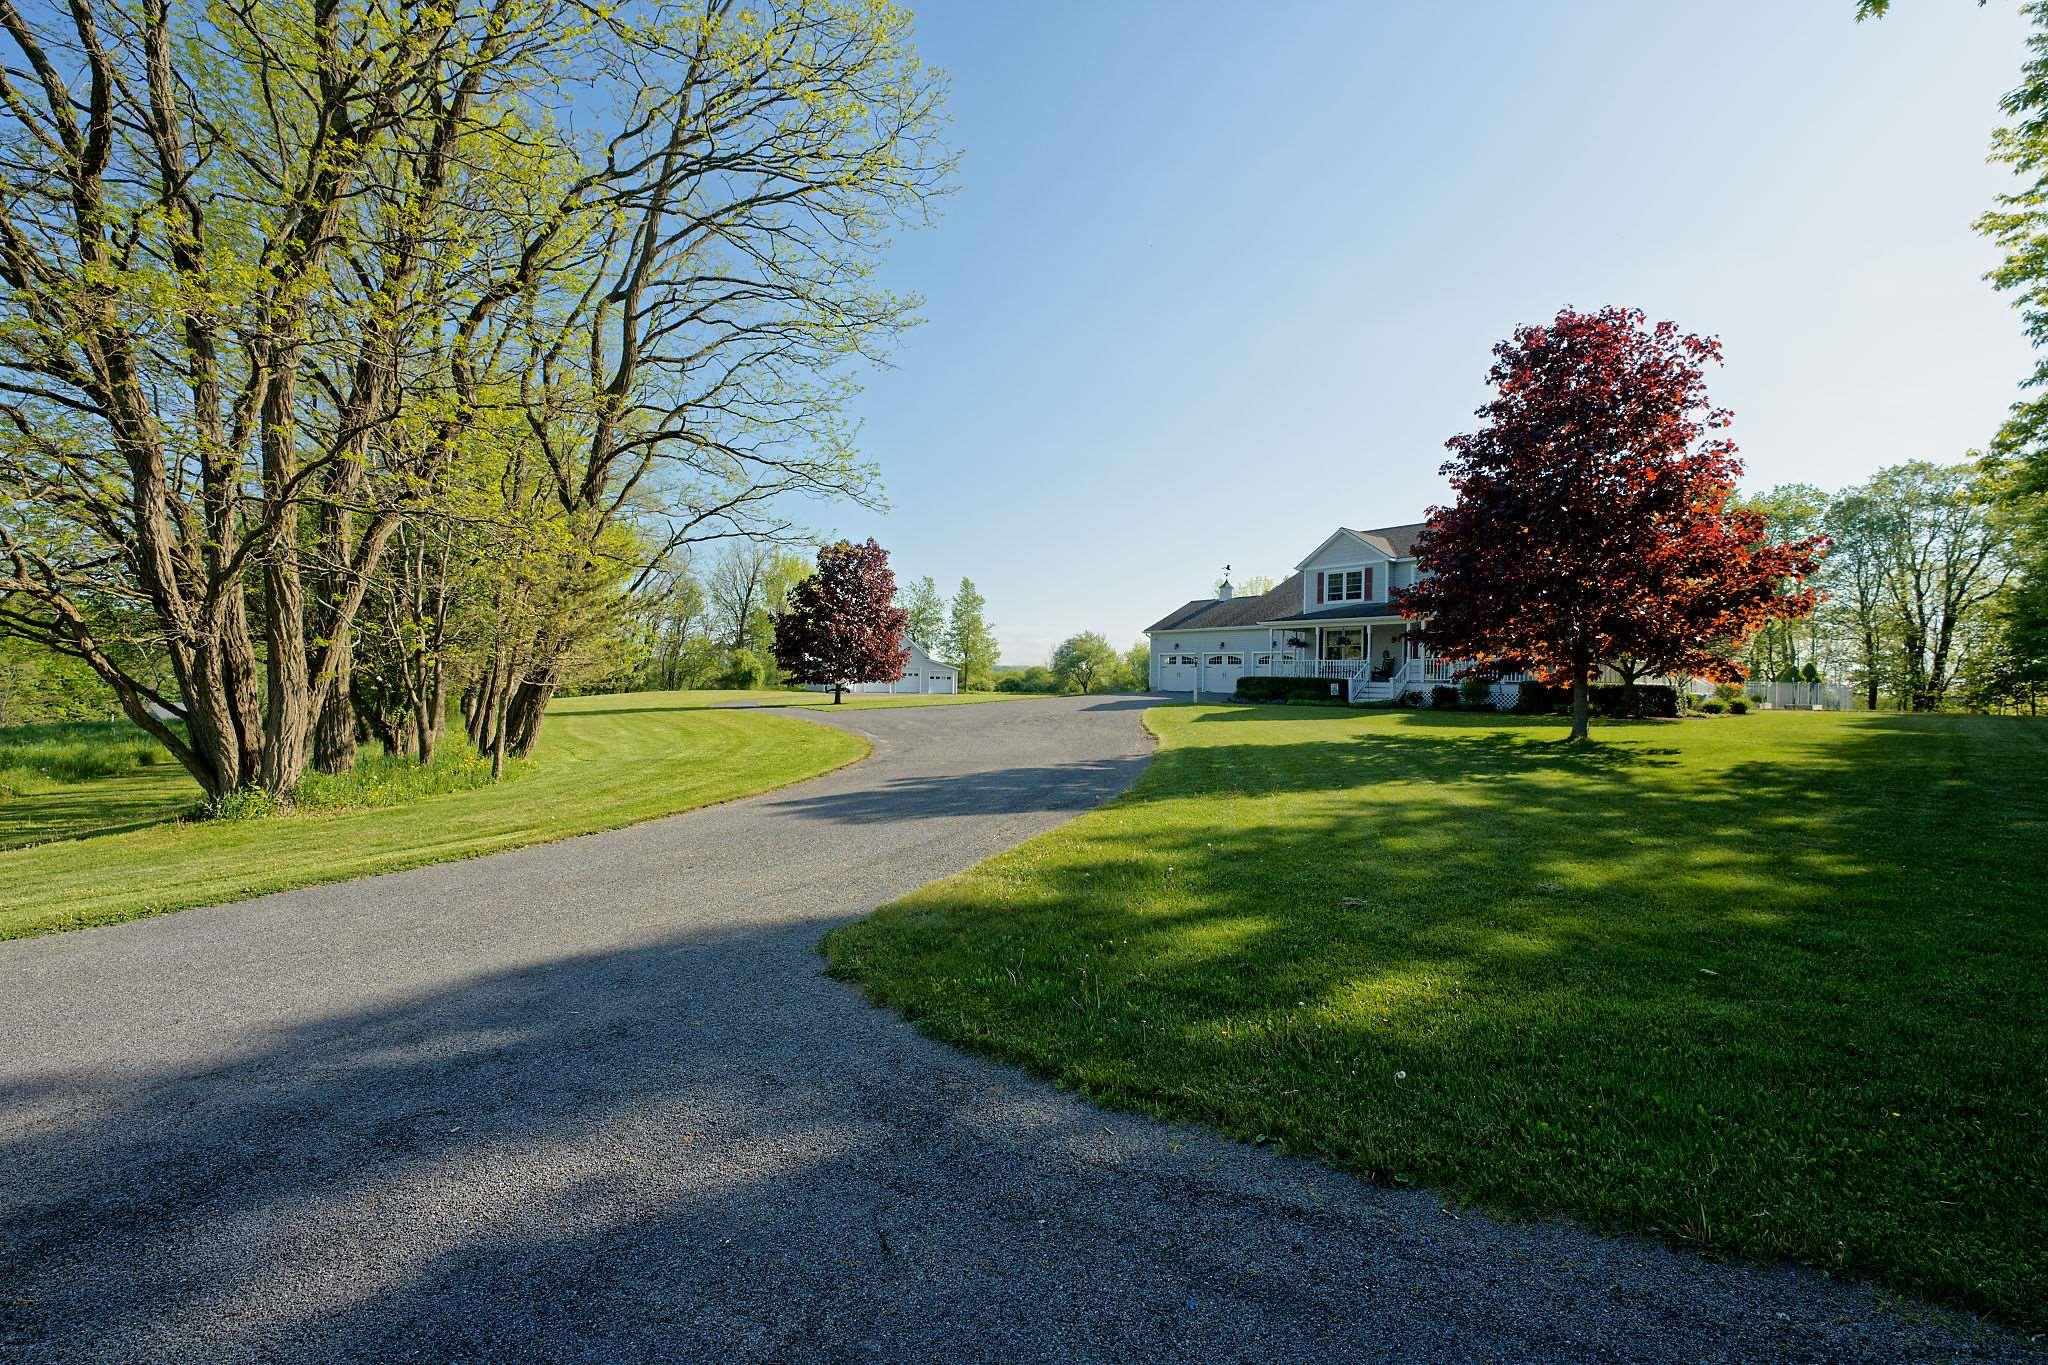 Glenville image 7